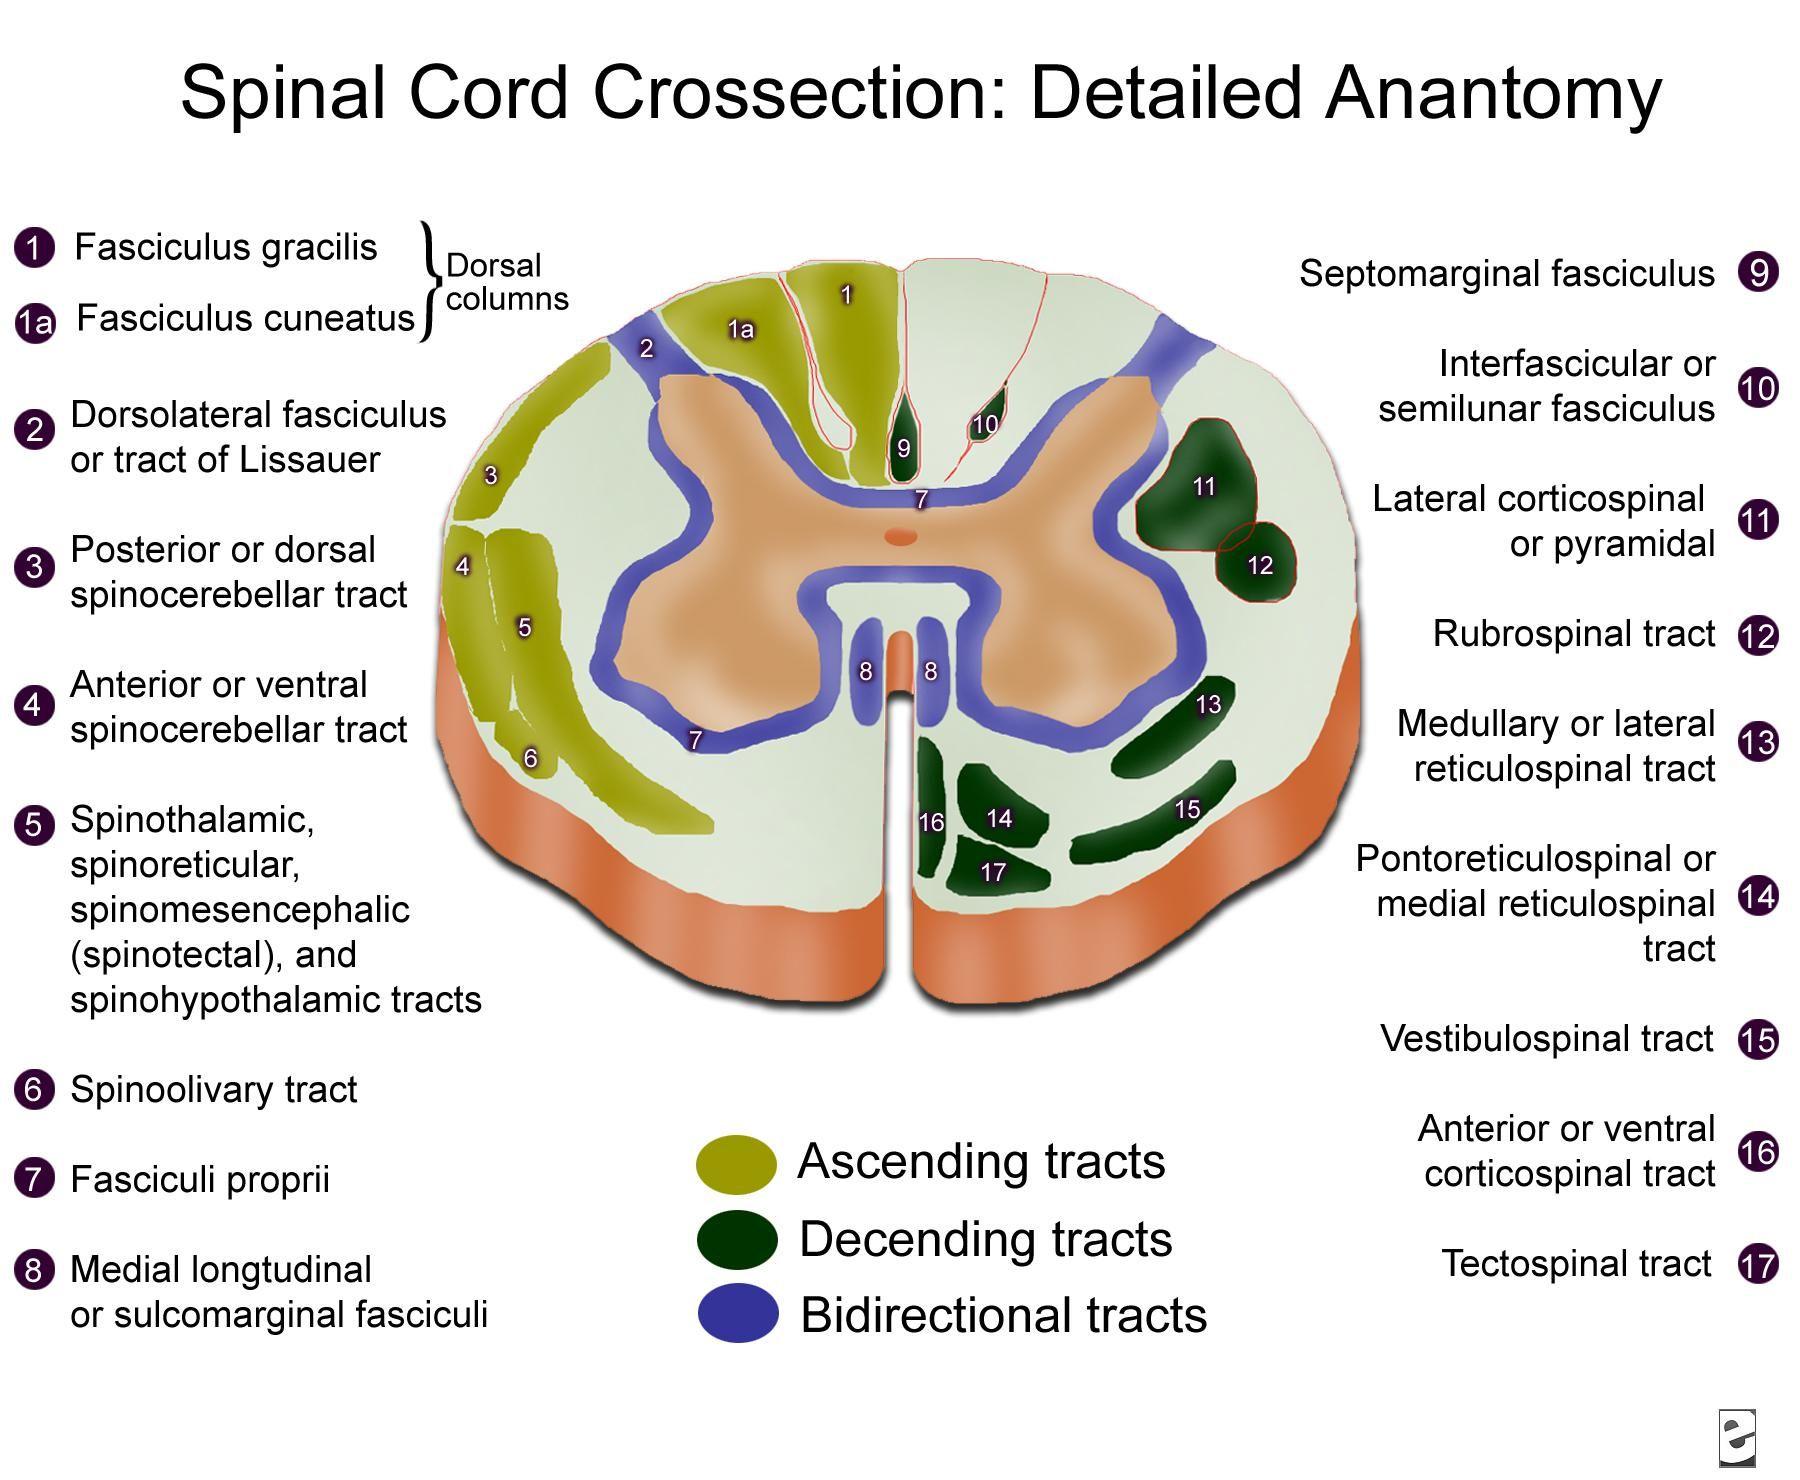 Anterolateral Pathway In Syringomyelia